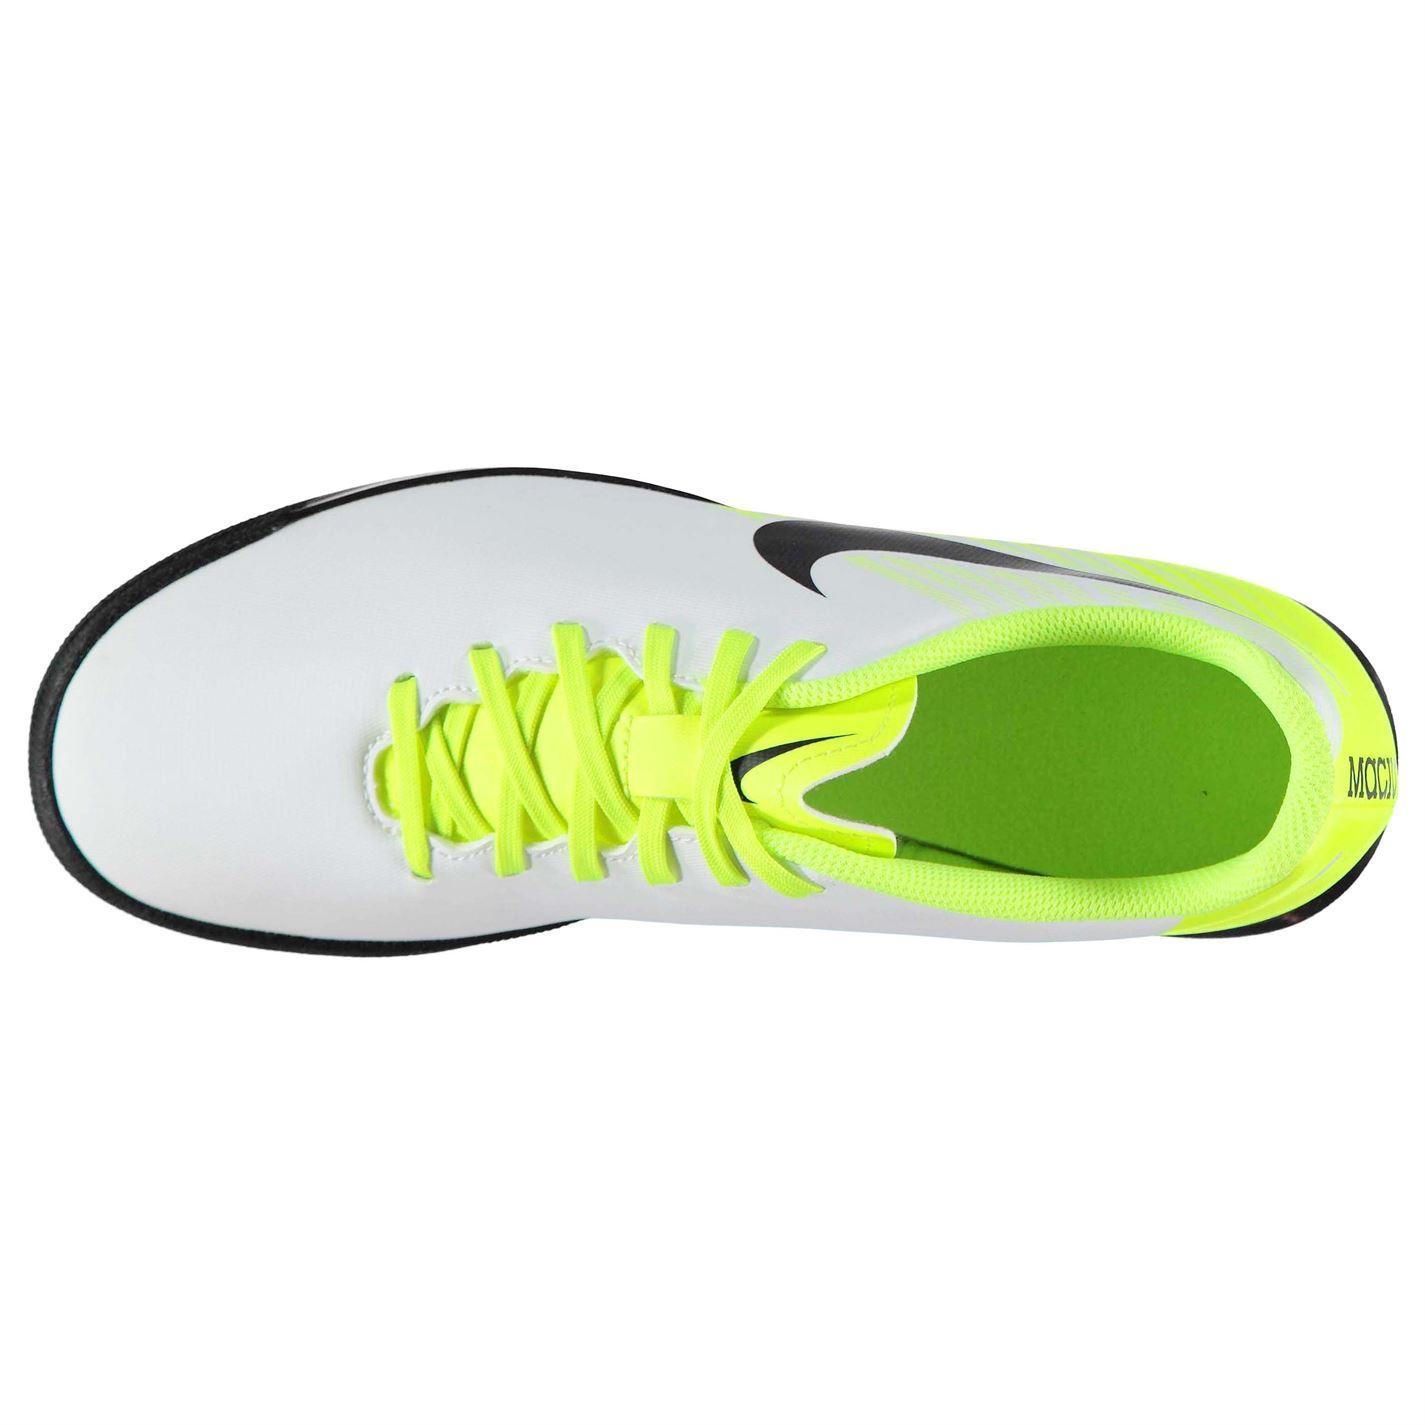 5e3b72ac5b16 ... Nike Magista Ola II AG Artificial Grass Trainers Mens Wht/Gry Football  Soccer